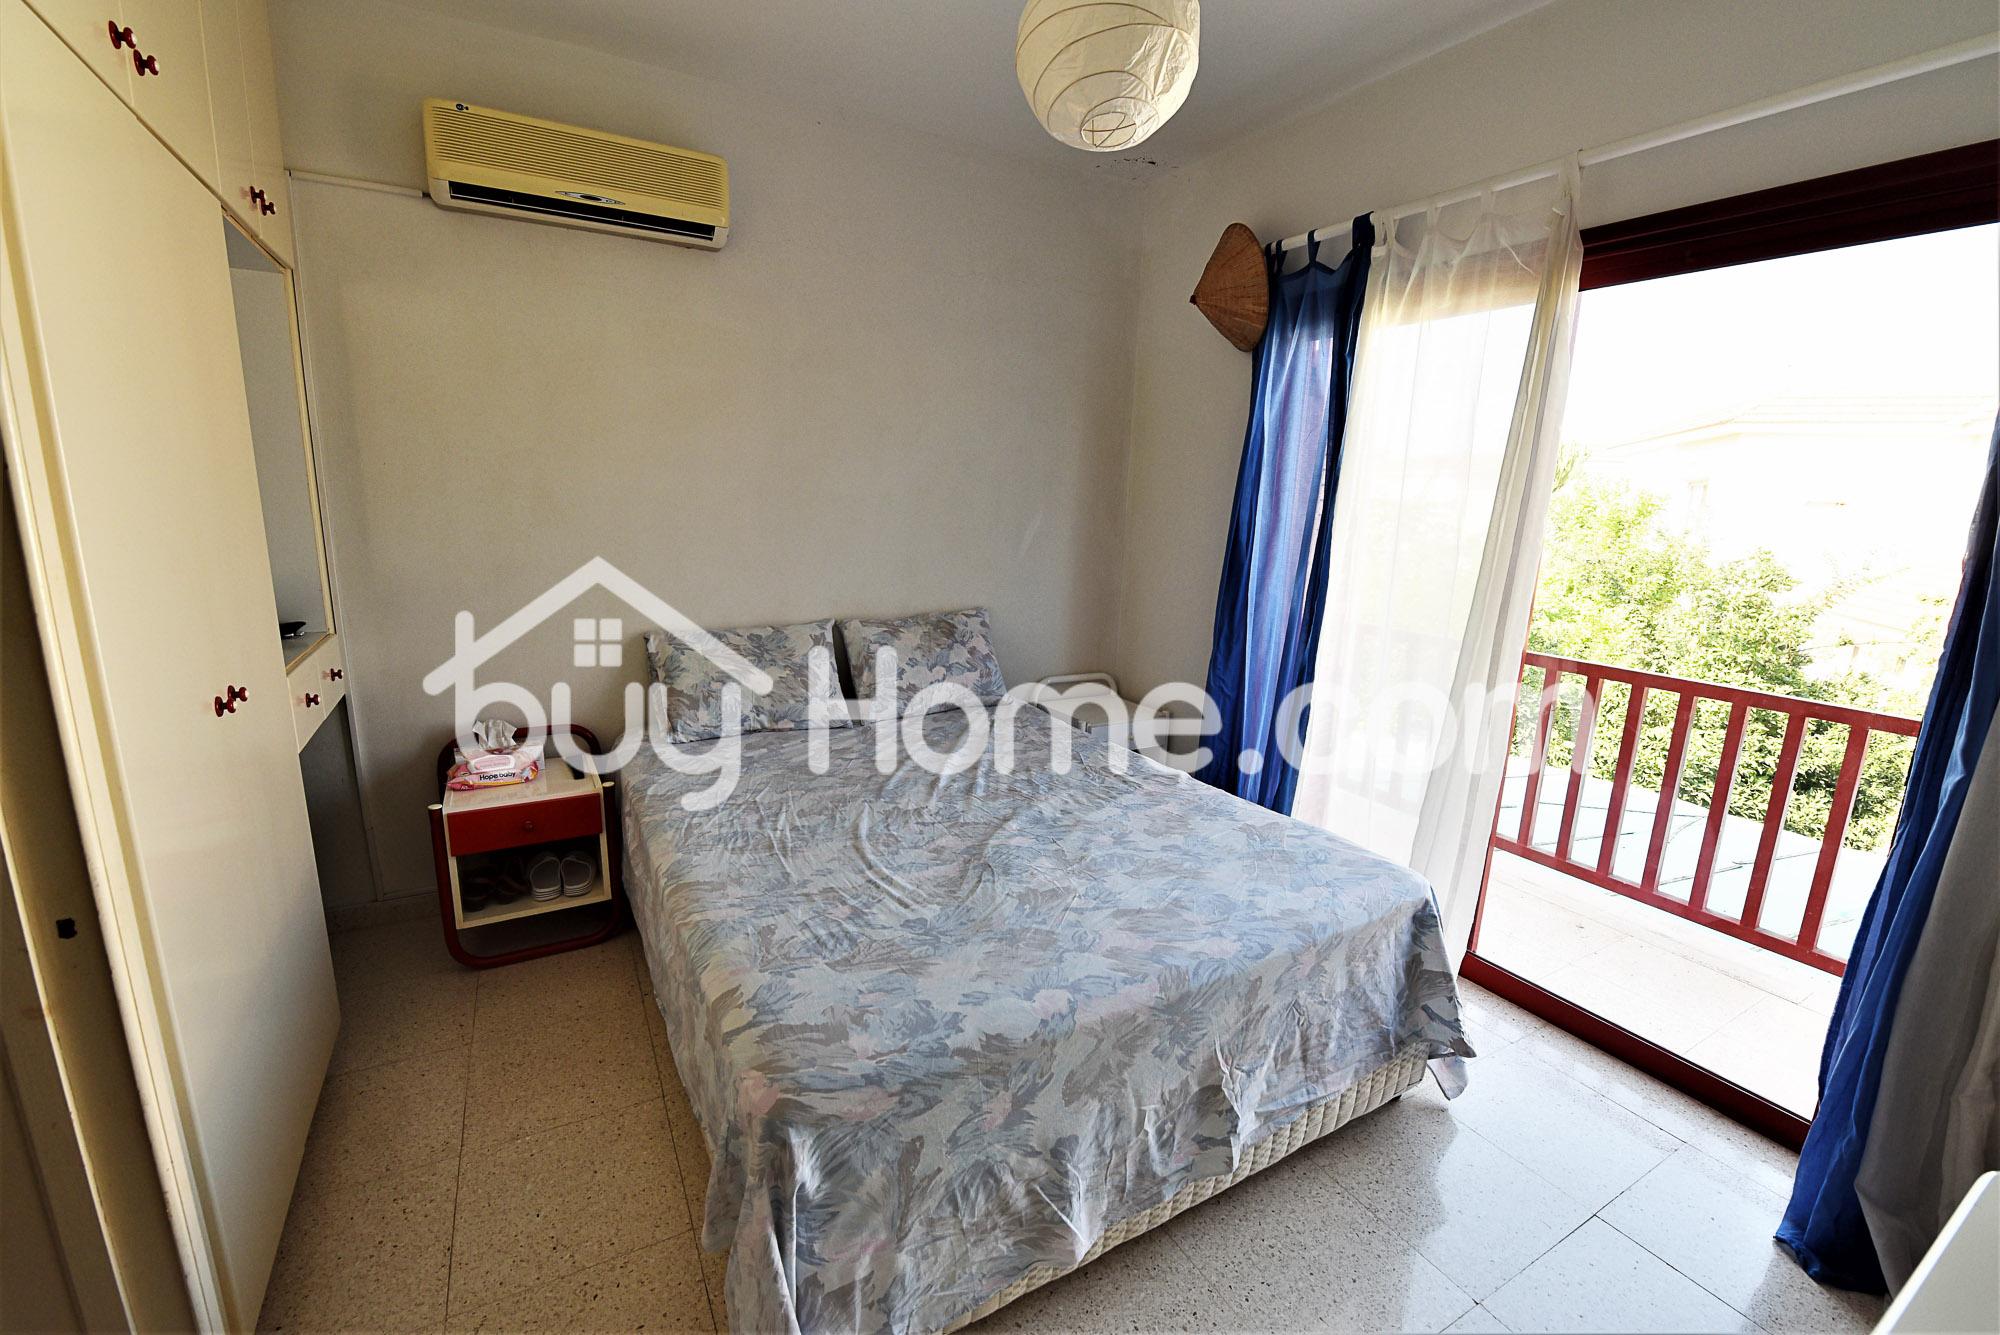 2 Bedroom Semi Detached | BuyHome